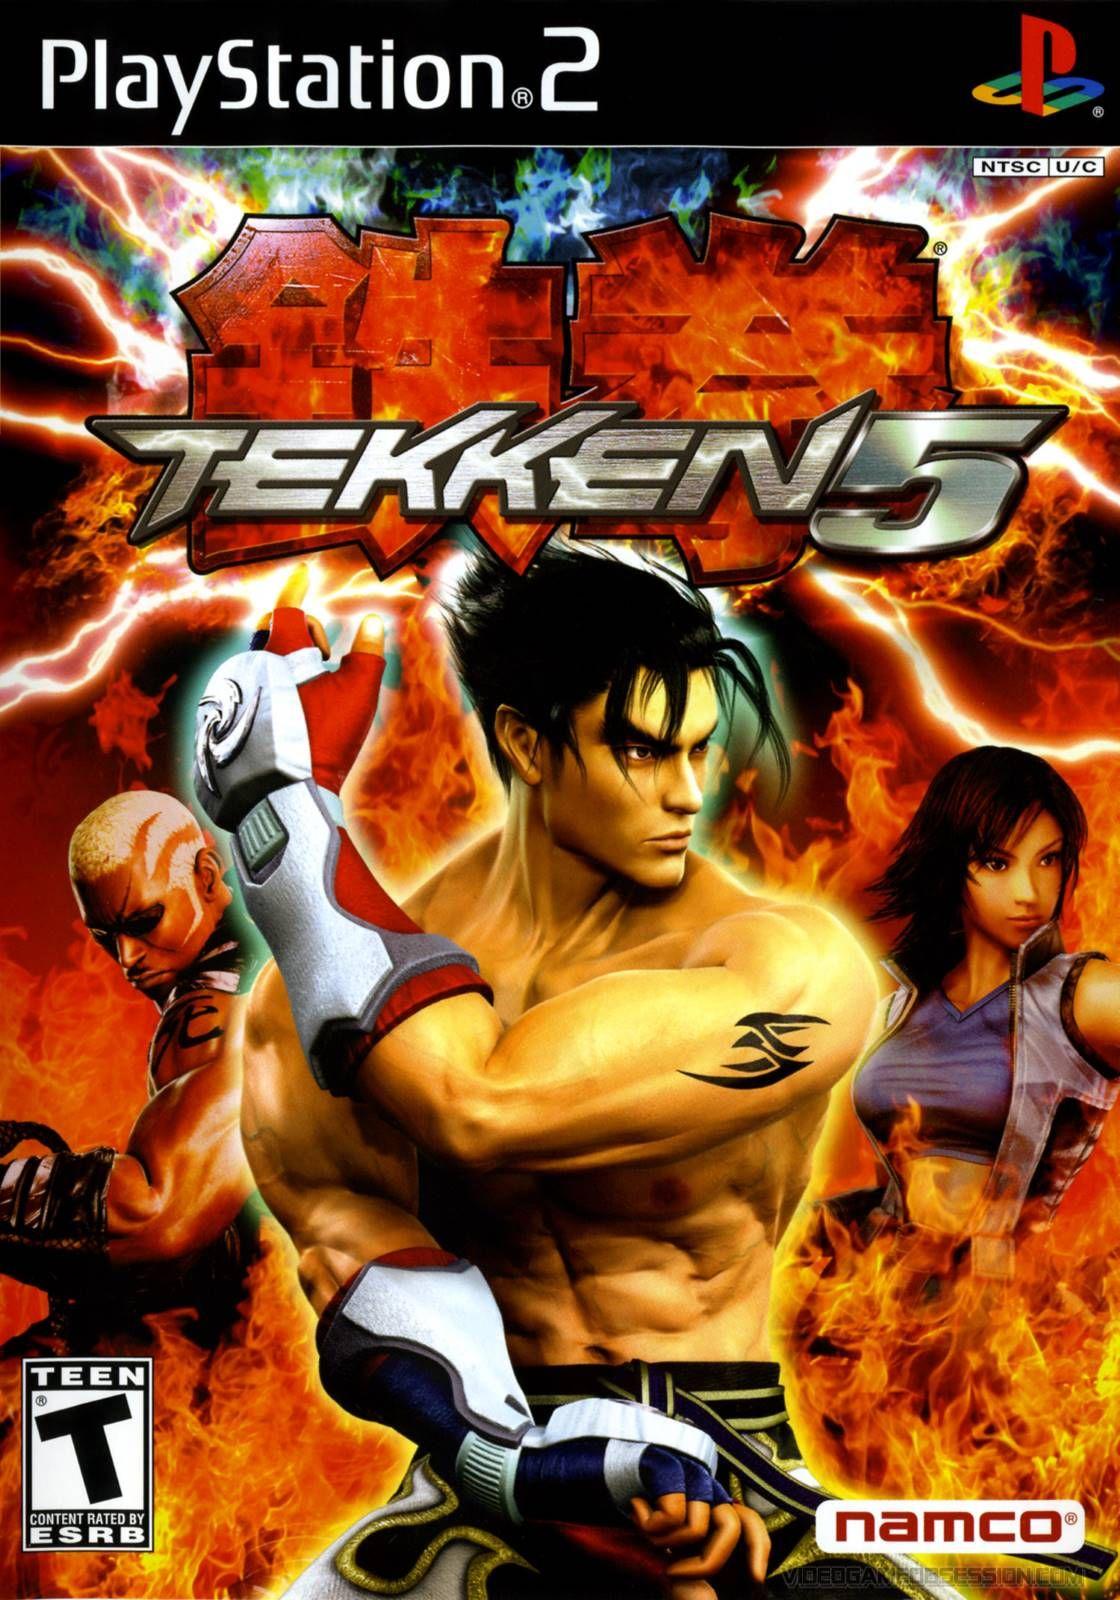 Tekken 5 Sony Playstation 2 Game Pc Games Download Download Games Game Download Free